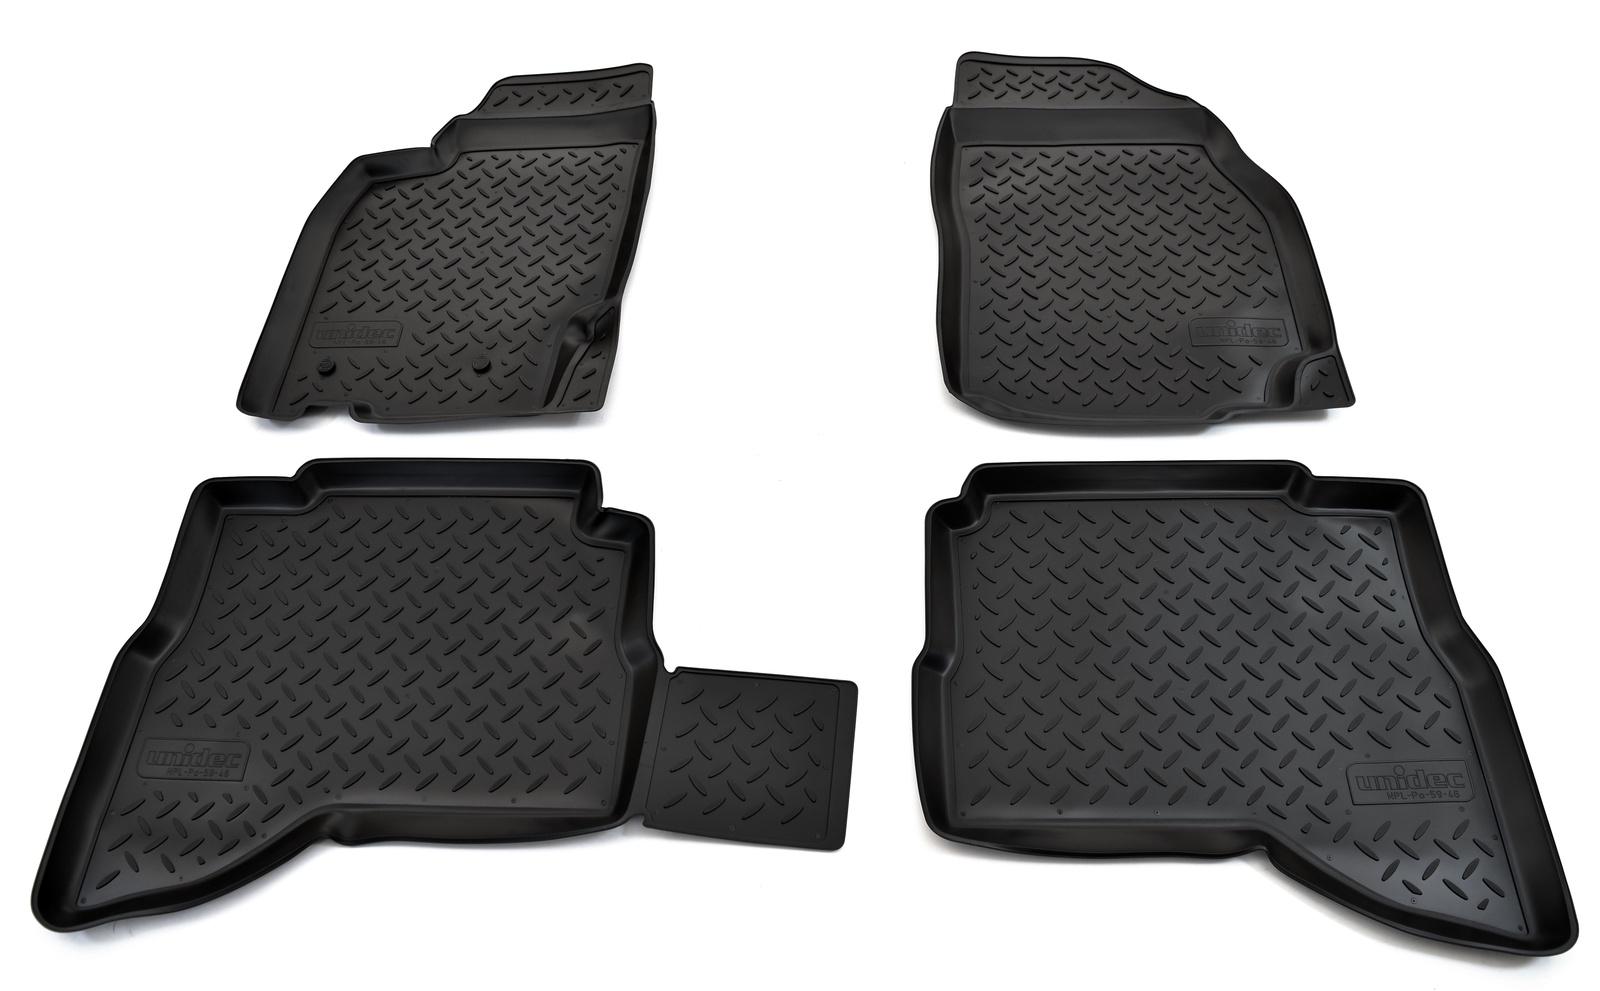 Коврики в салон автомобиля Norplast для Mitsubishi Pajero Sport (1998-2008), NPL-Po-59-46, черный коврики в салон mitsubishi pajero sport i 1998 2008 внед 5 шт текстиль